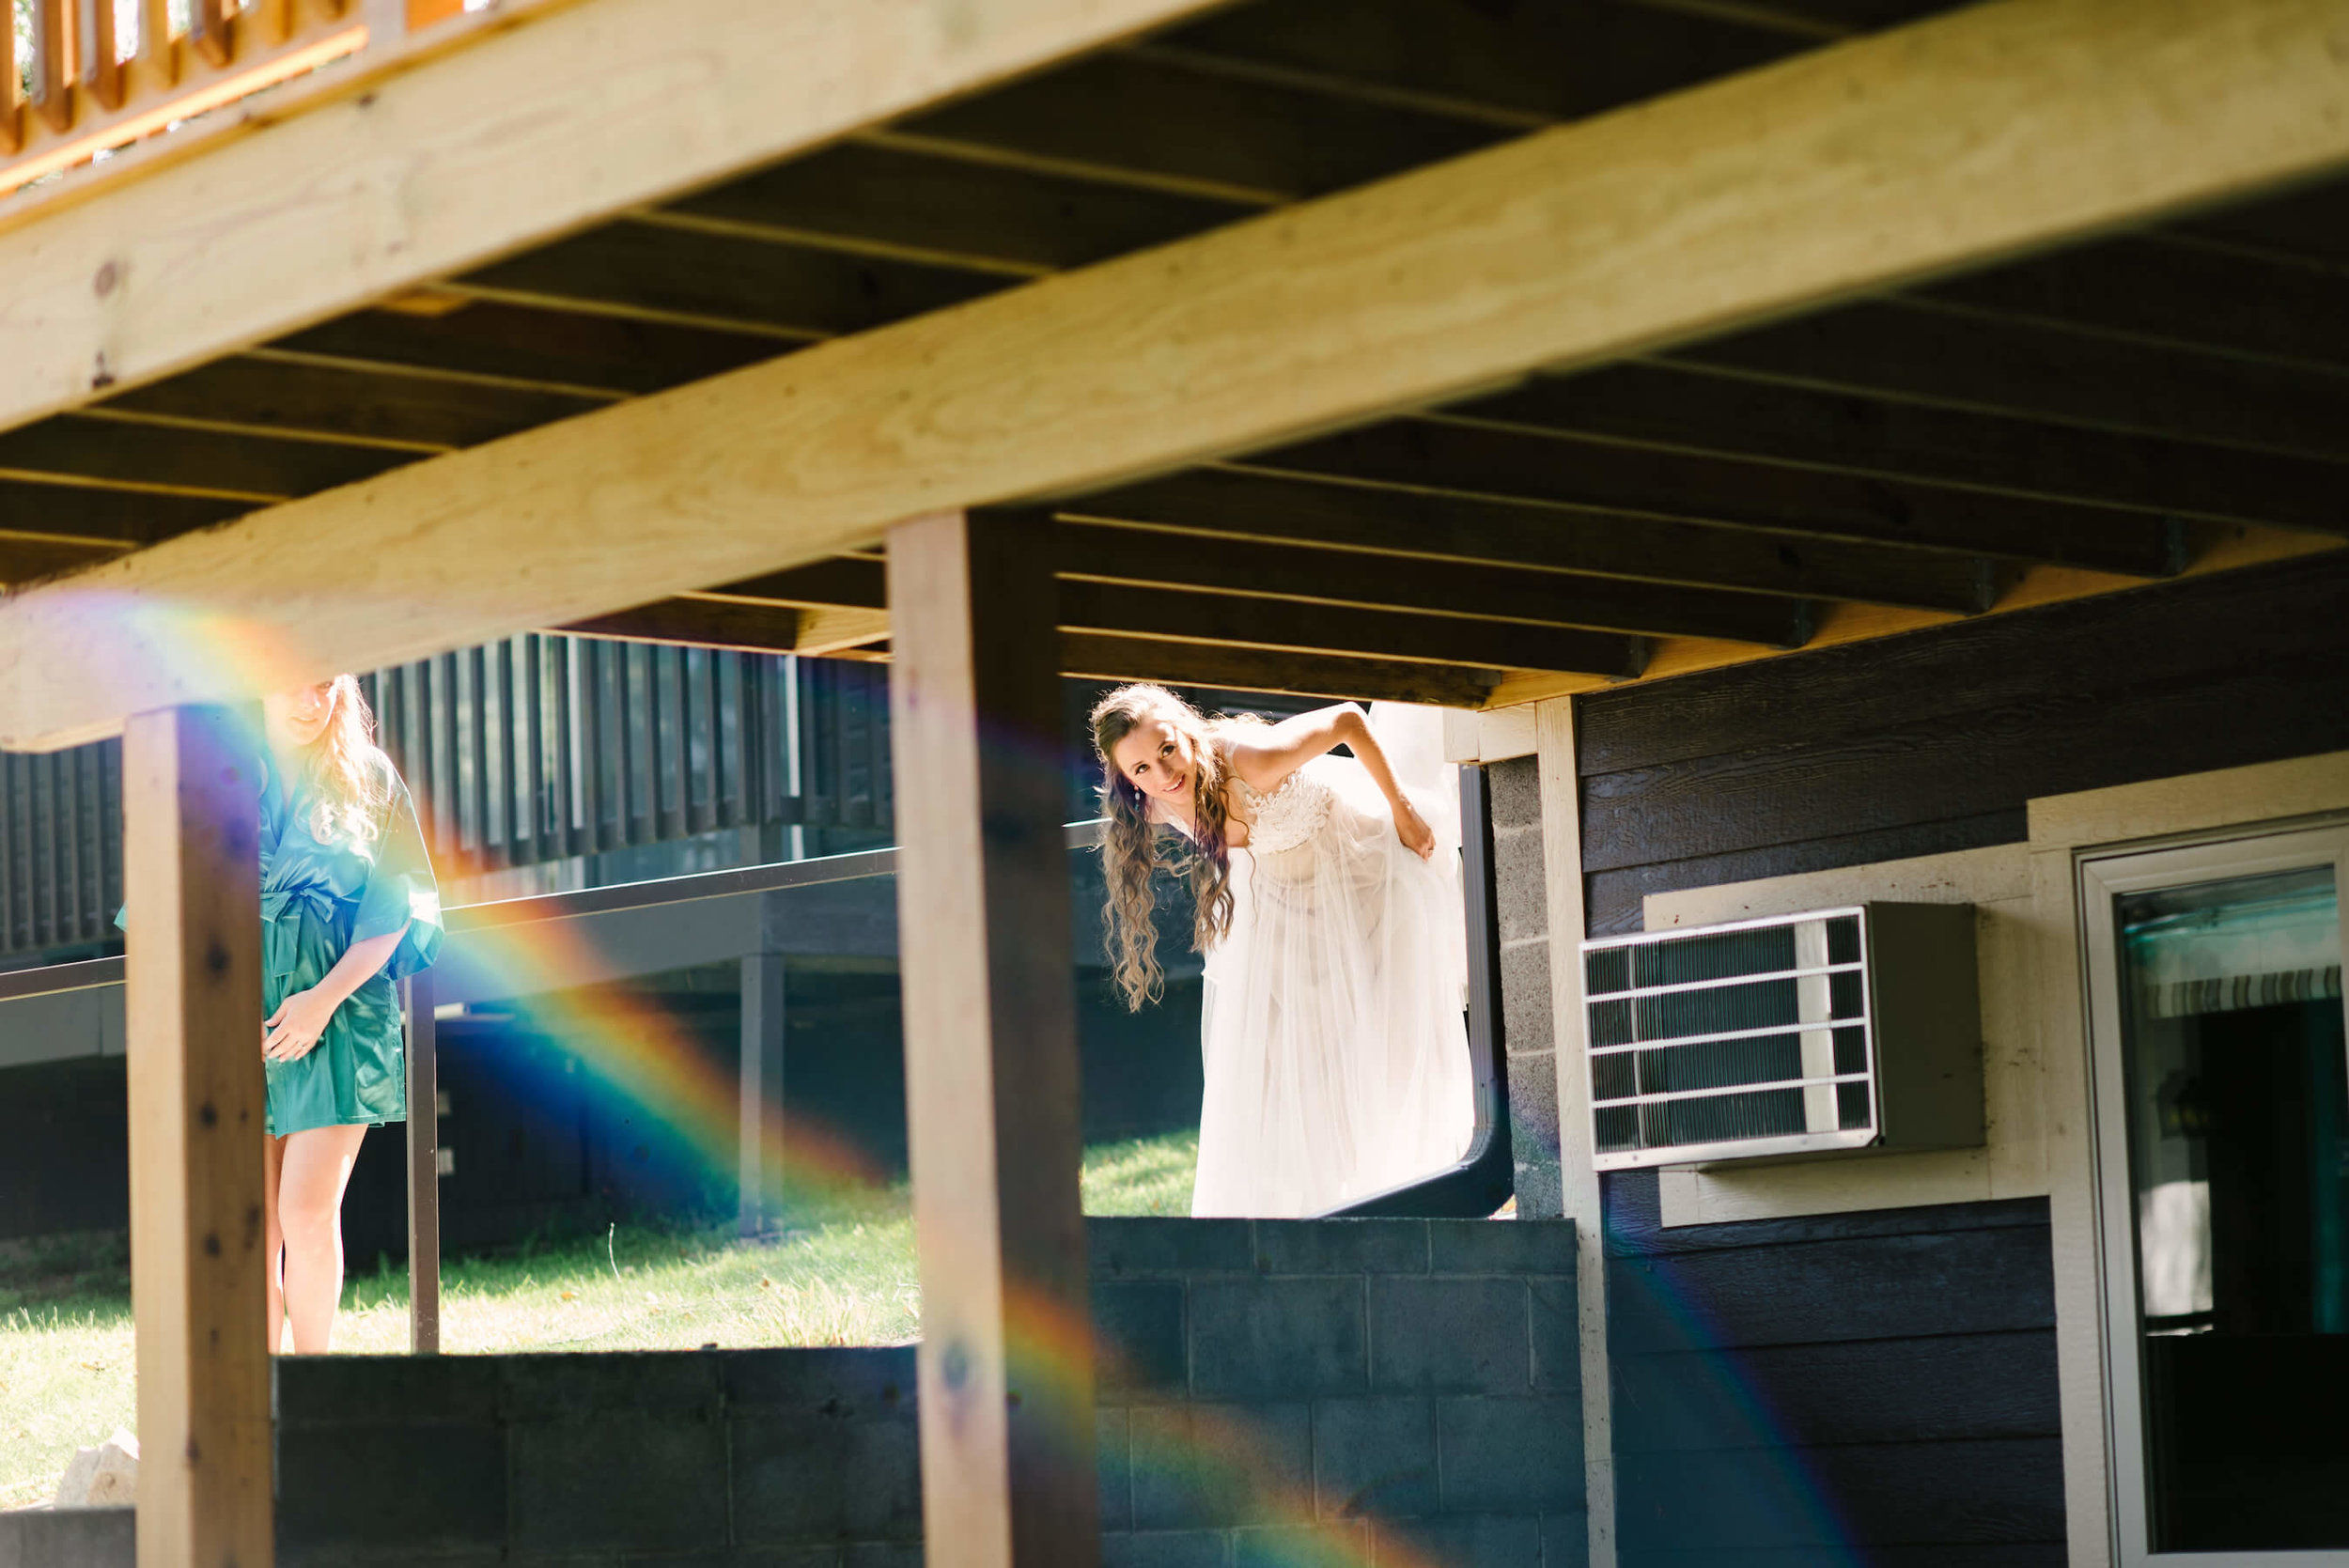 engle-olson-wedding-blair-taylor-12.jpg